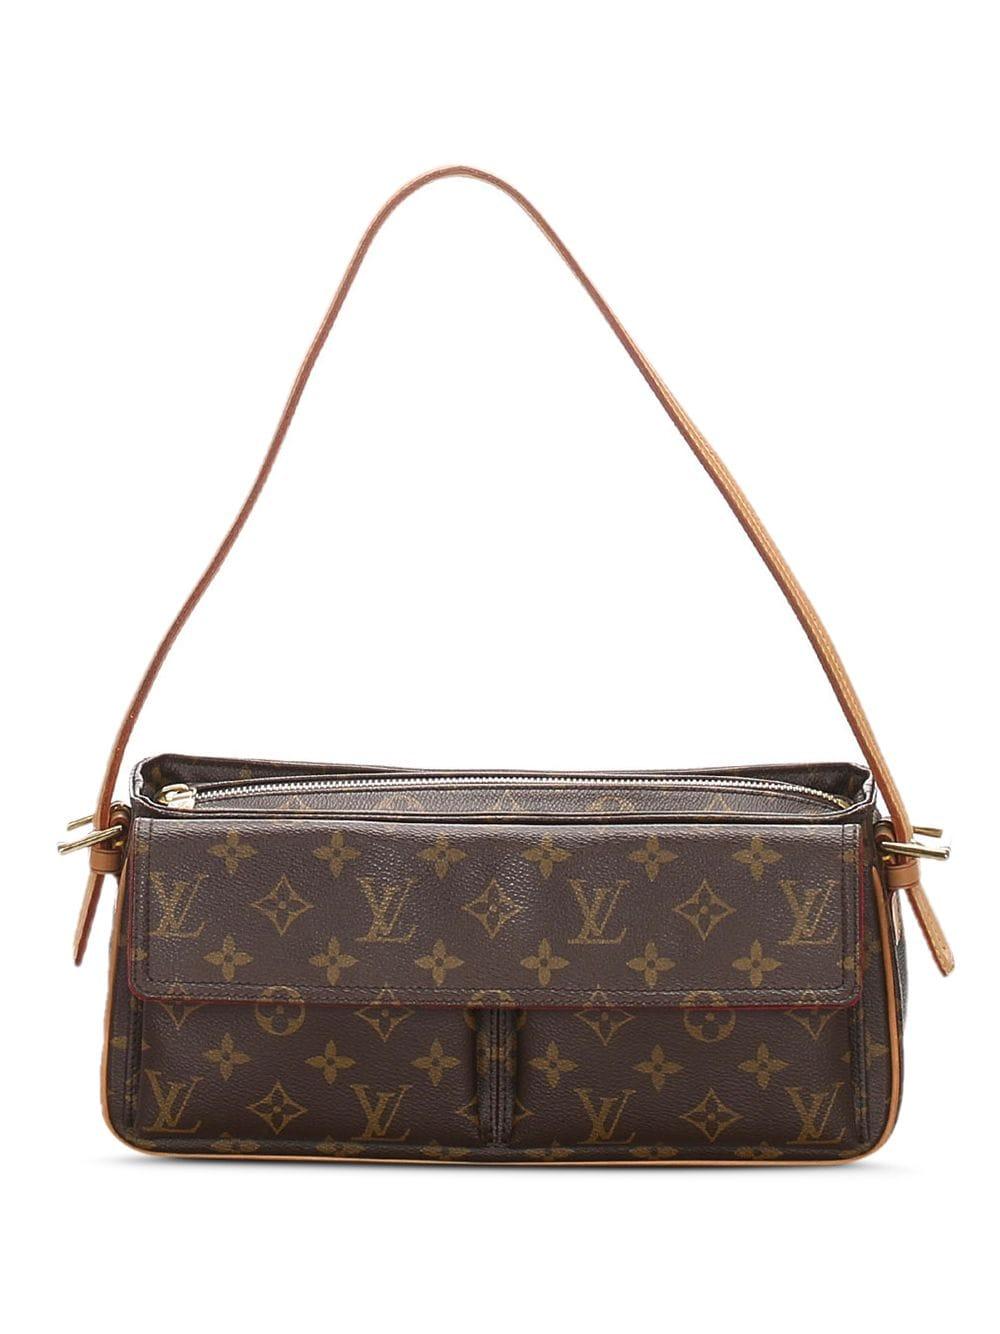 Louis Vuitton '05 Monogram Bag